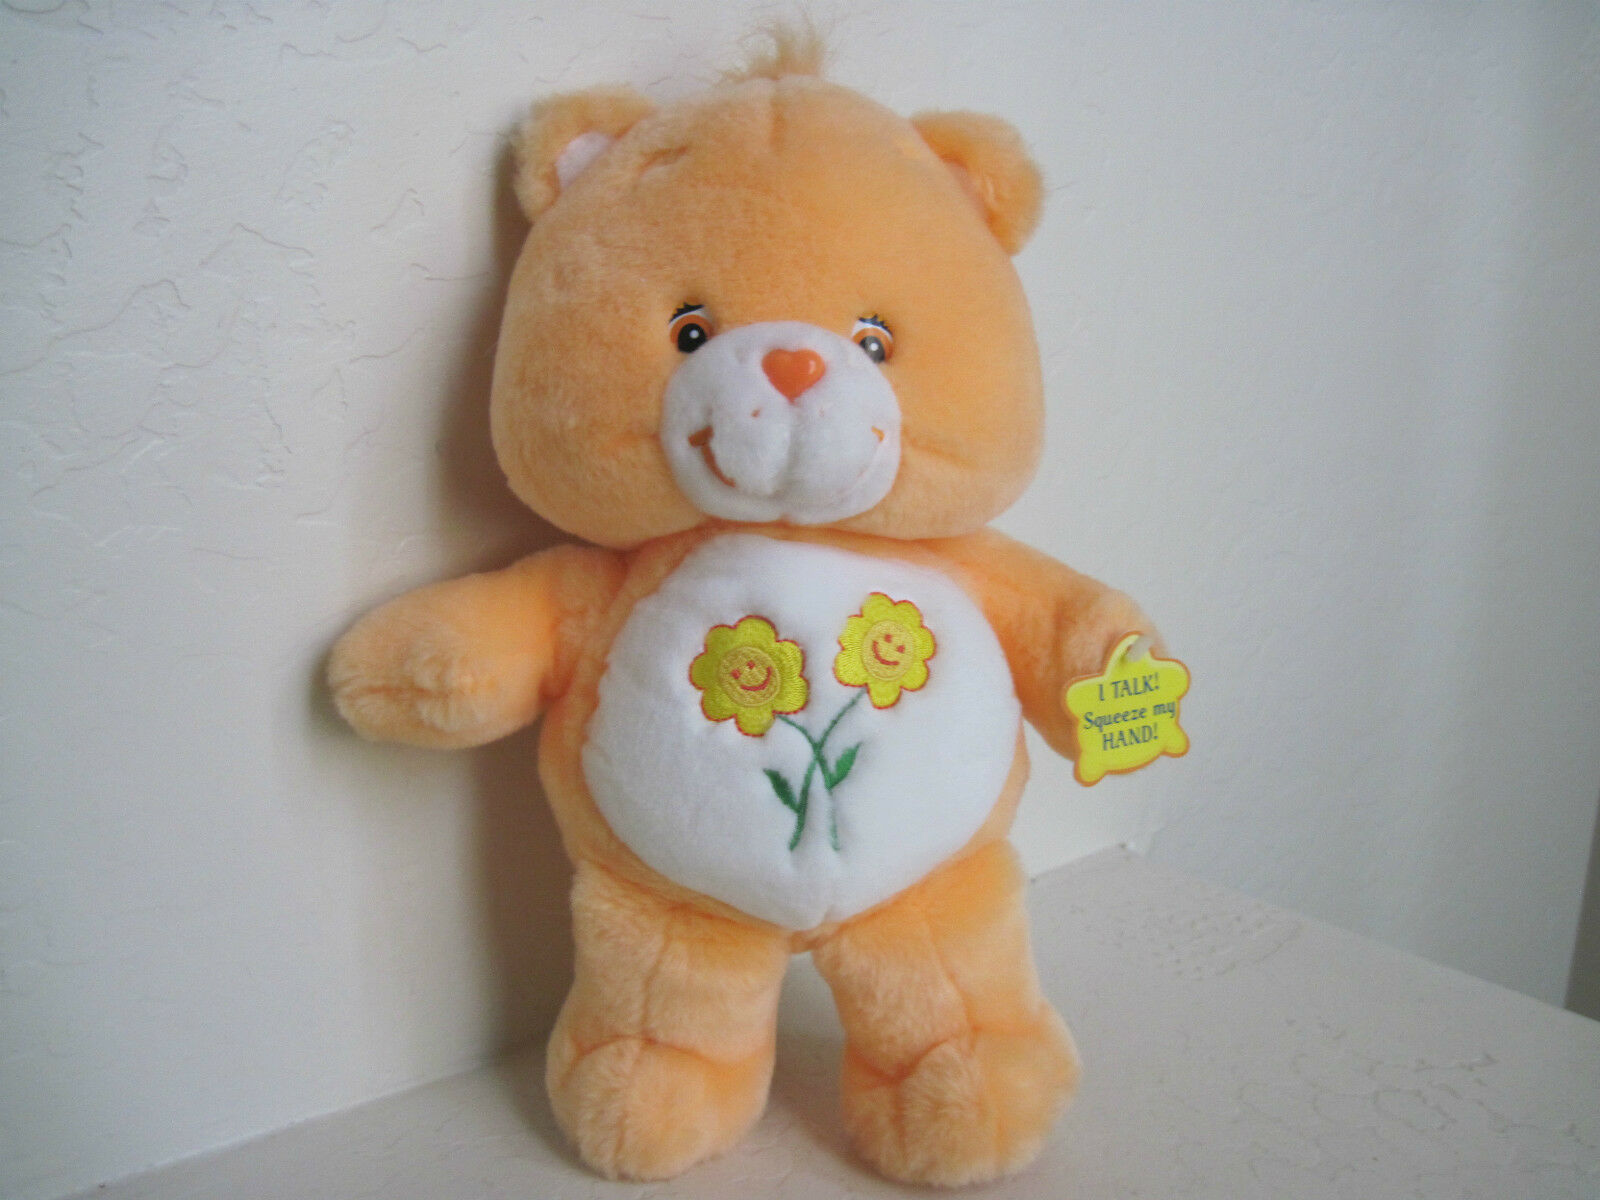 13 13 13  Care Bears  FRIEND BEAR TALKING Plush Stuffed Animal 1763f0